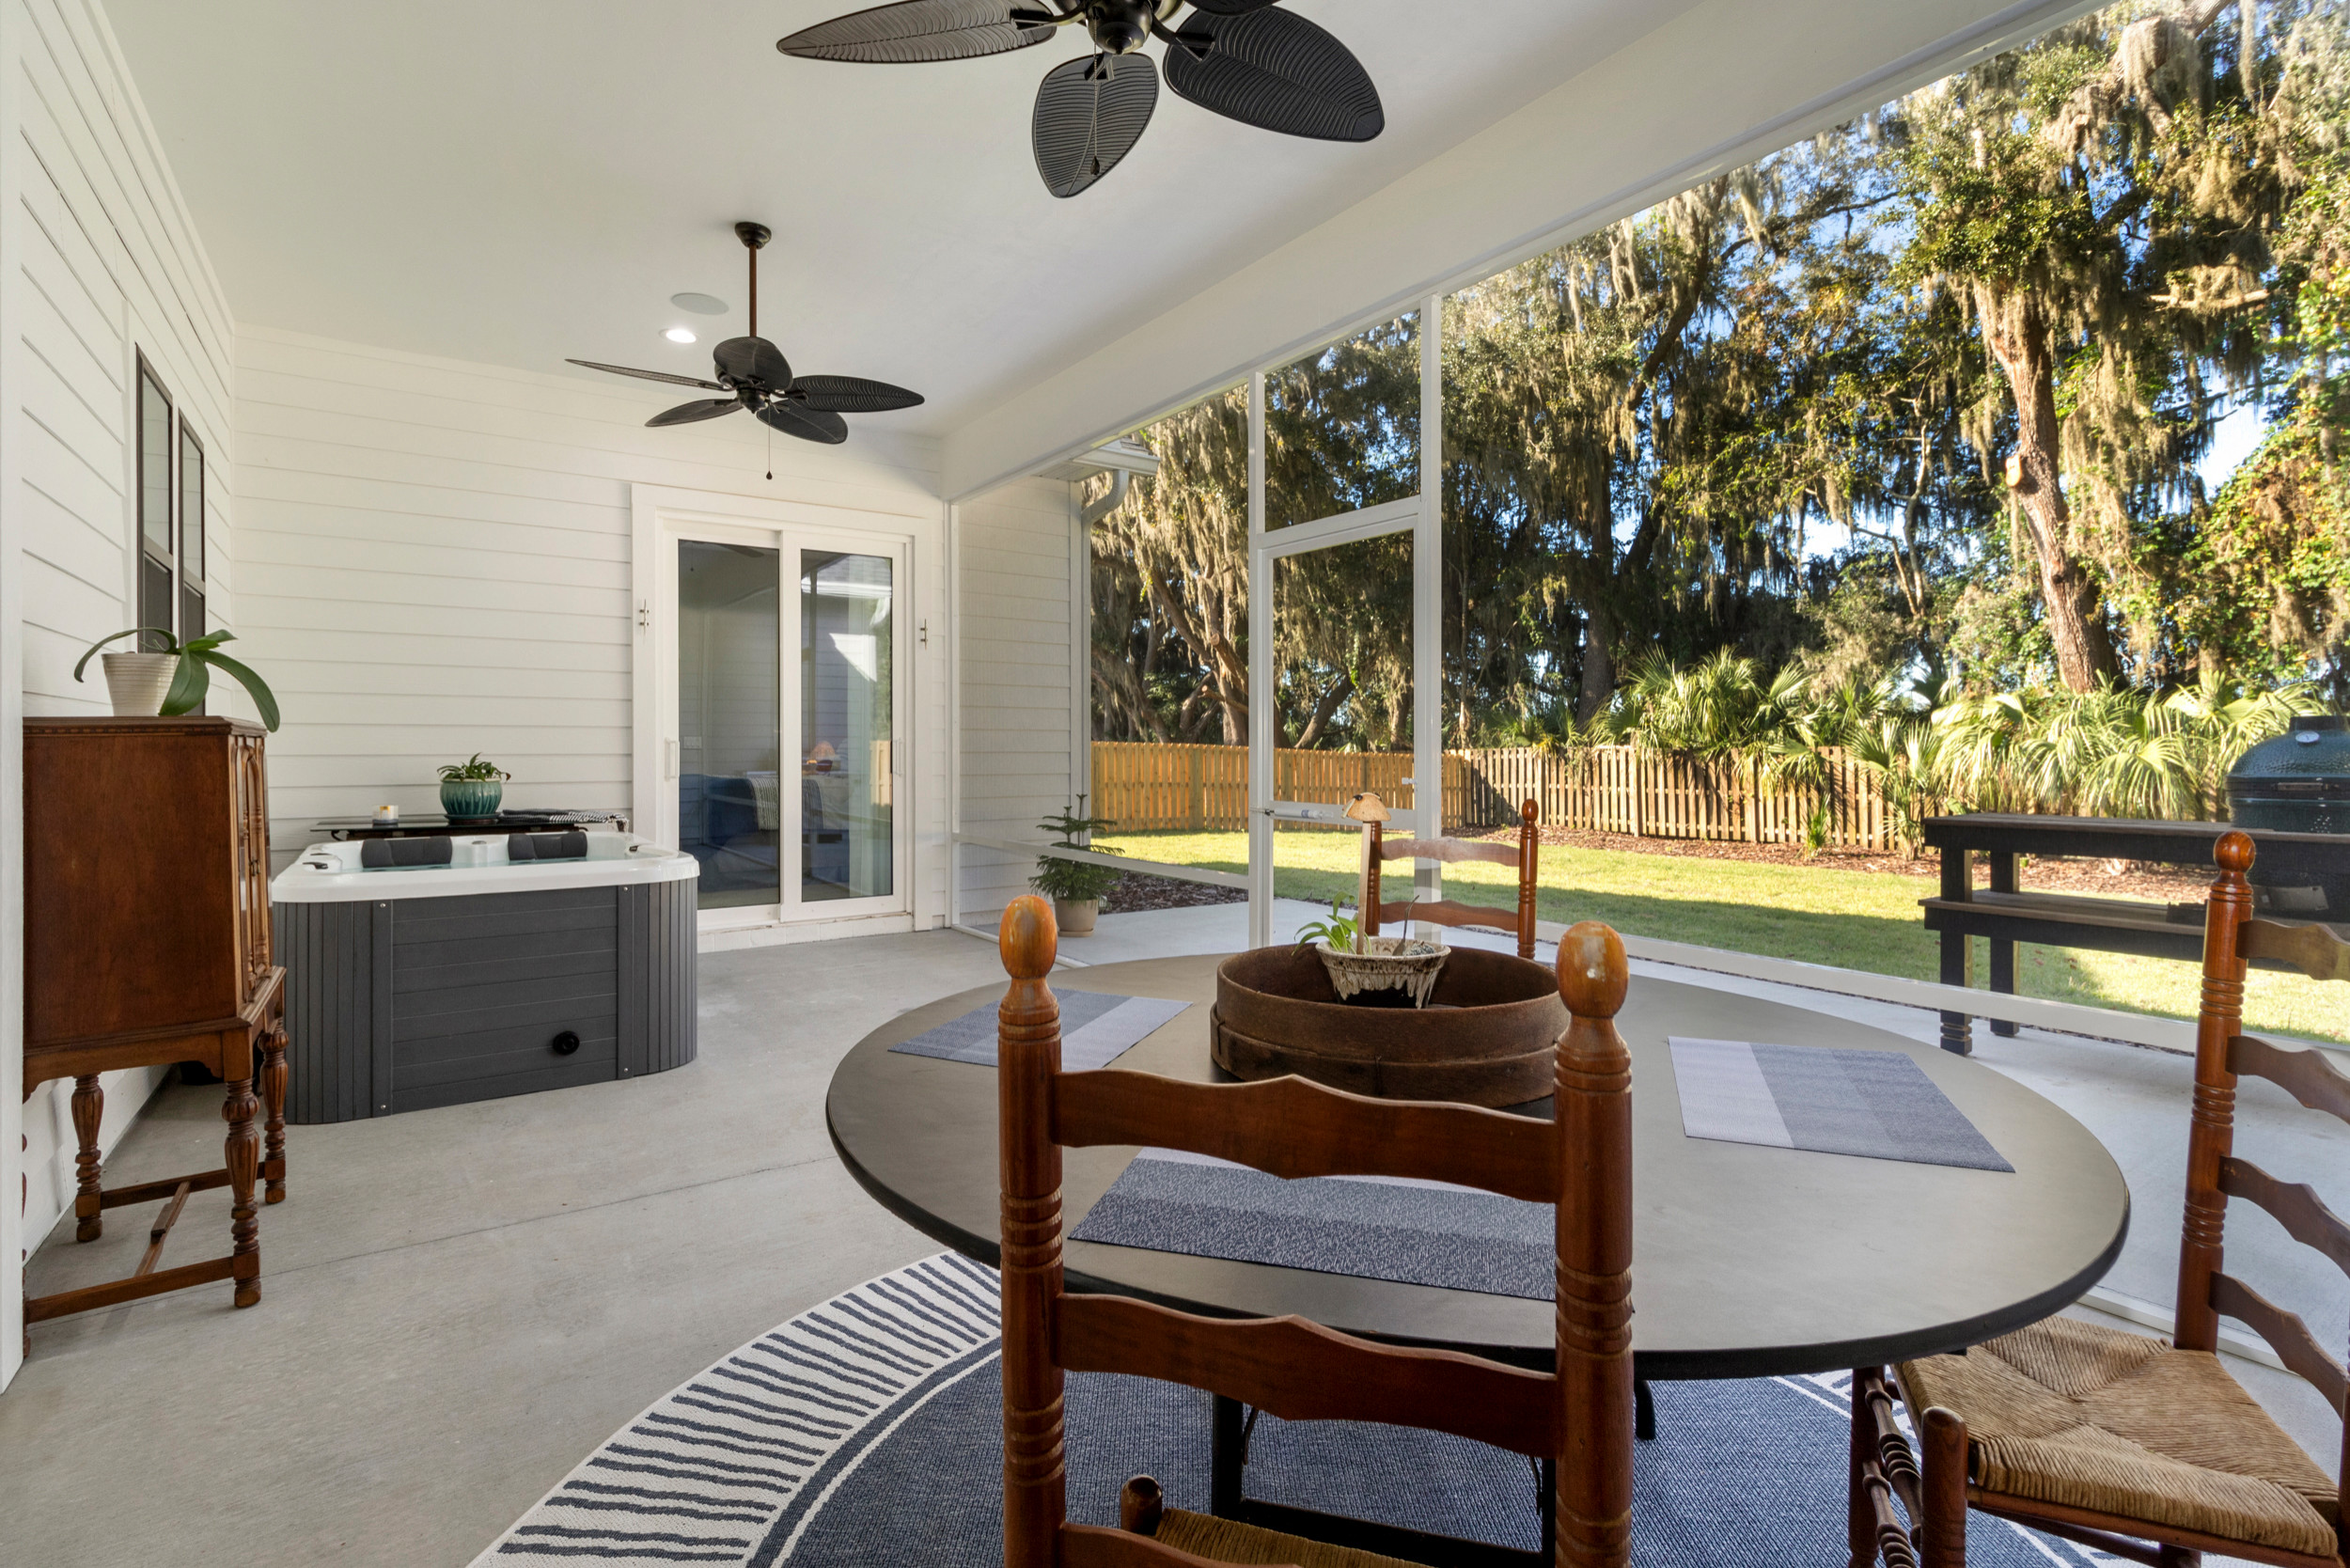 New Home - The Lynn Model - 1,942